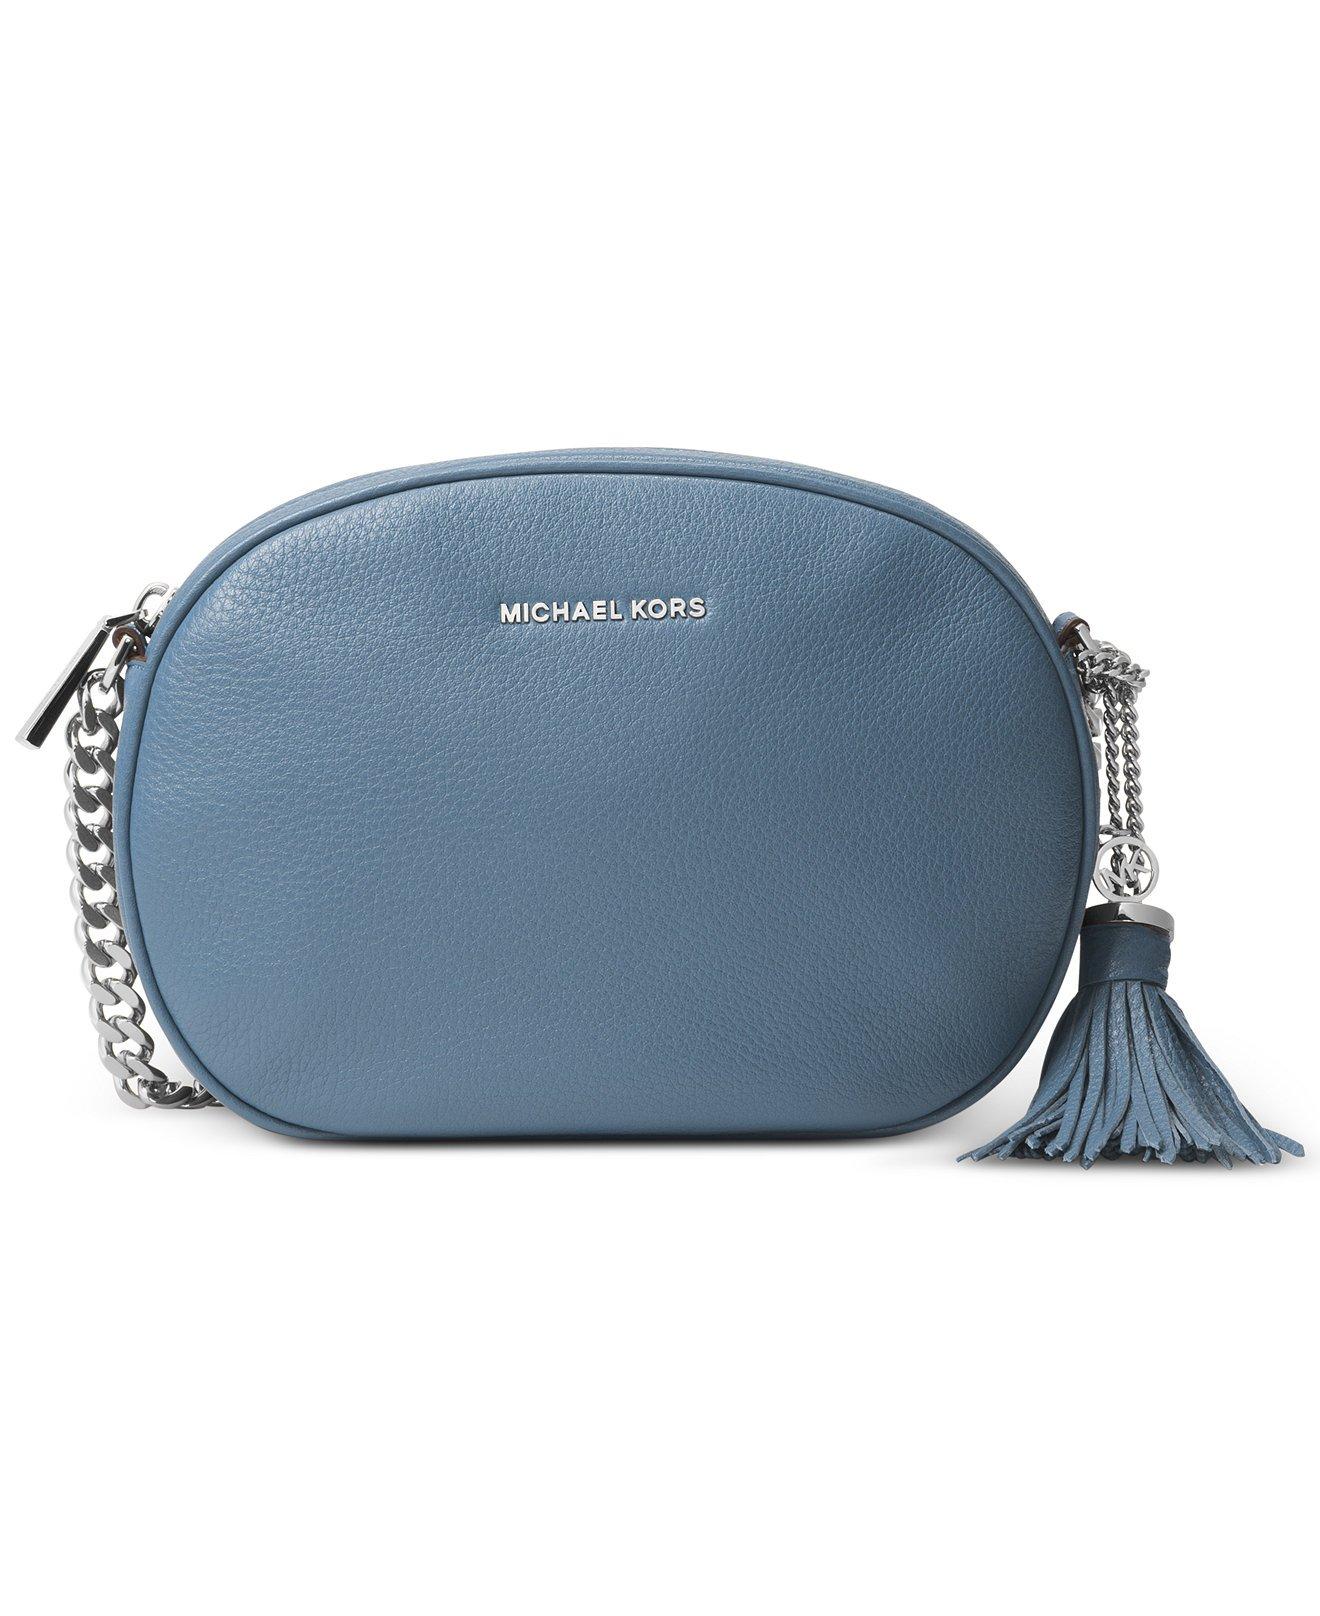 e2260c0de5f9 Galleon - Michael Kors Ginny Ladies Medium Leather Crossbody Handbag  30H6SGNM2L